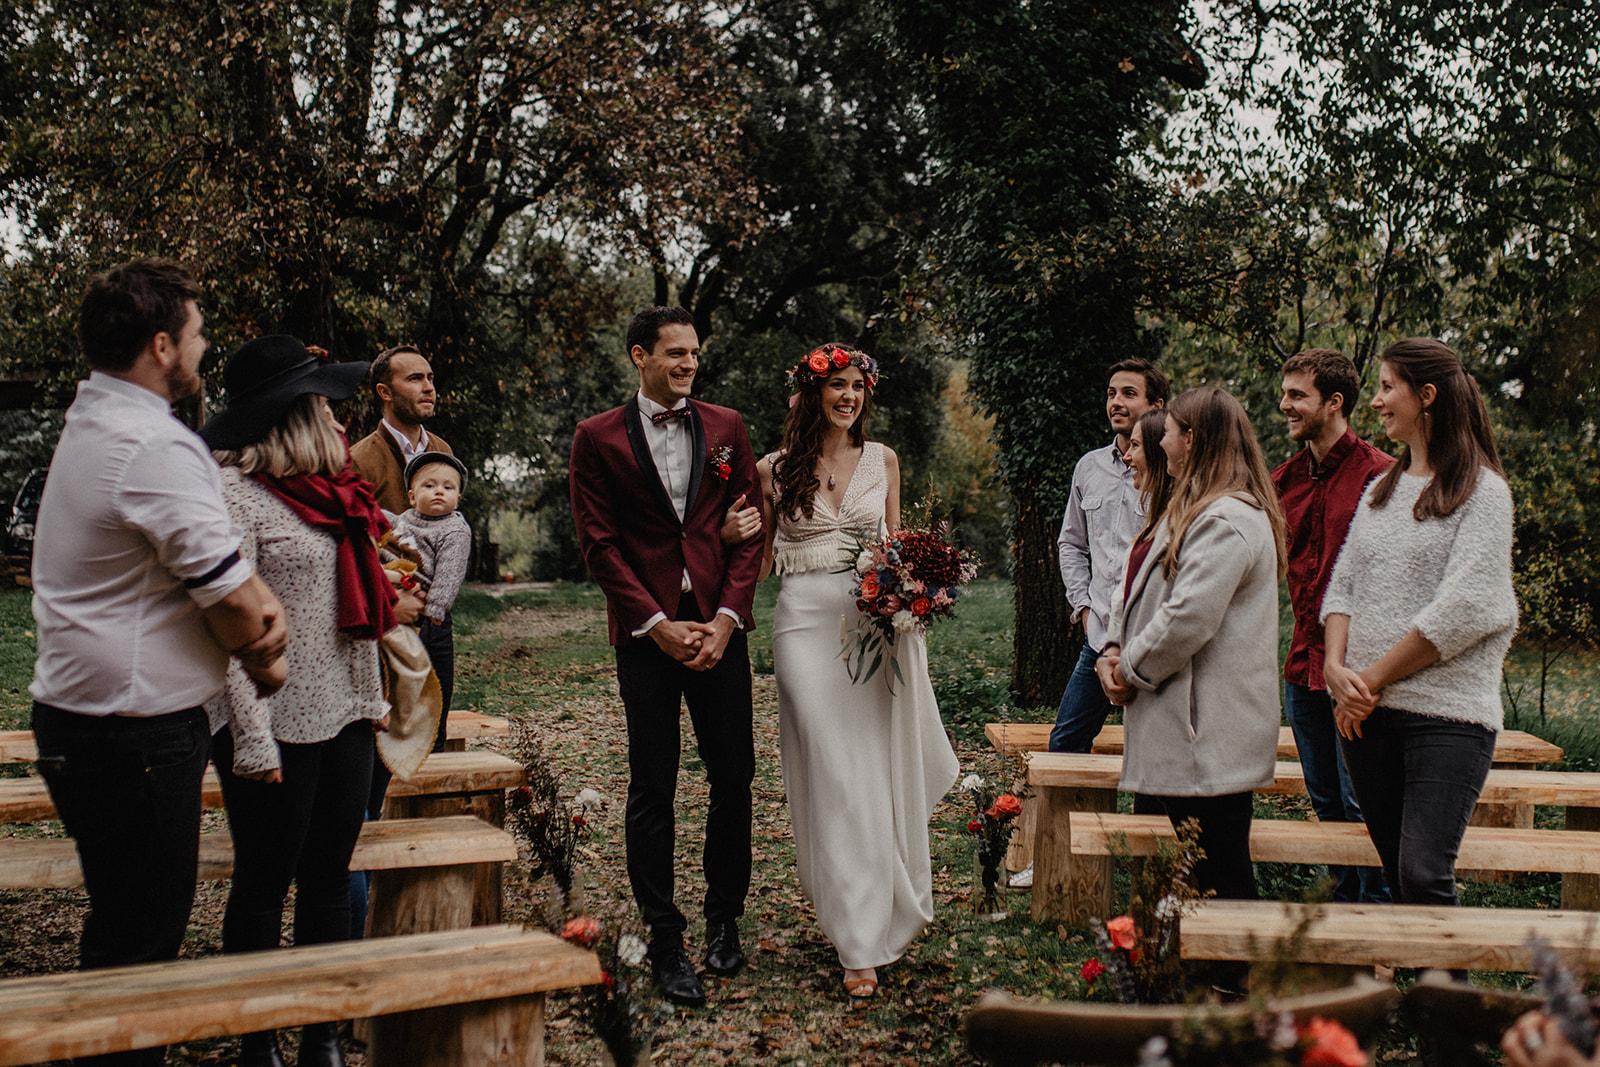 bröllop utomhusceremoni